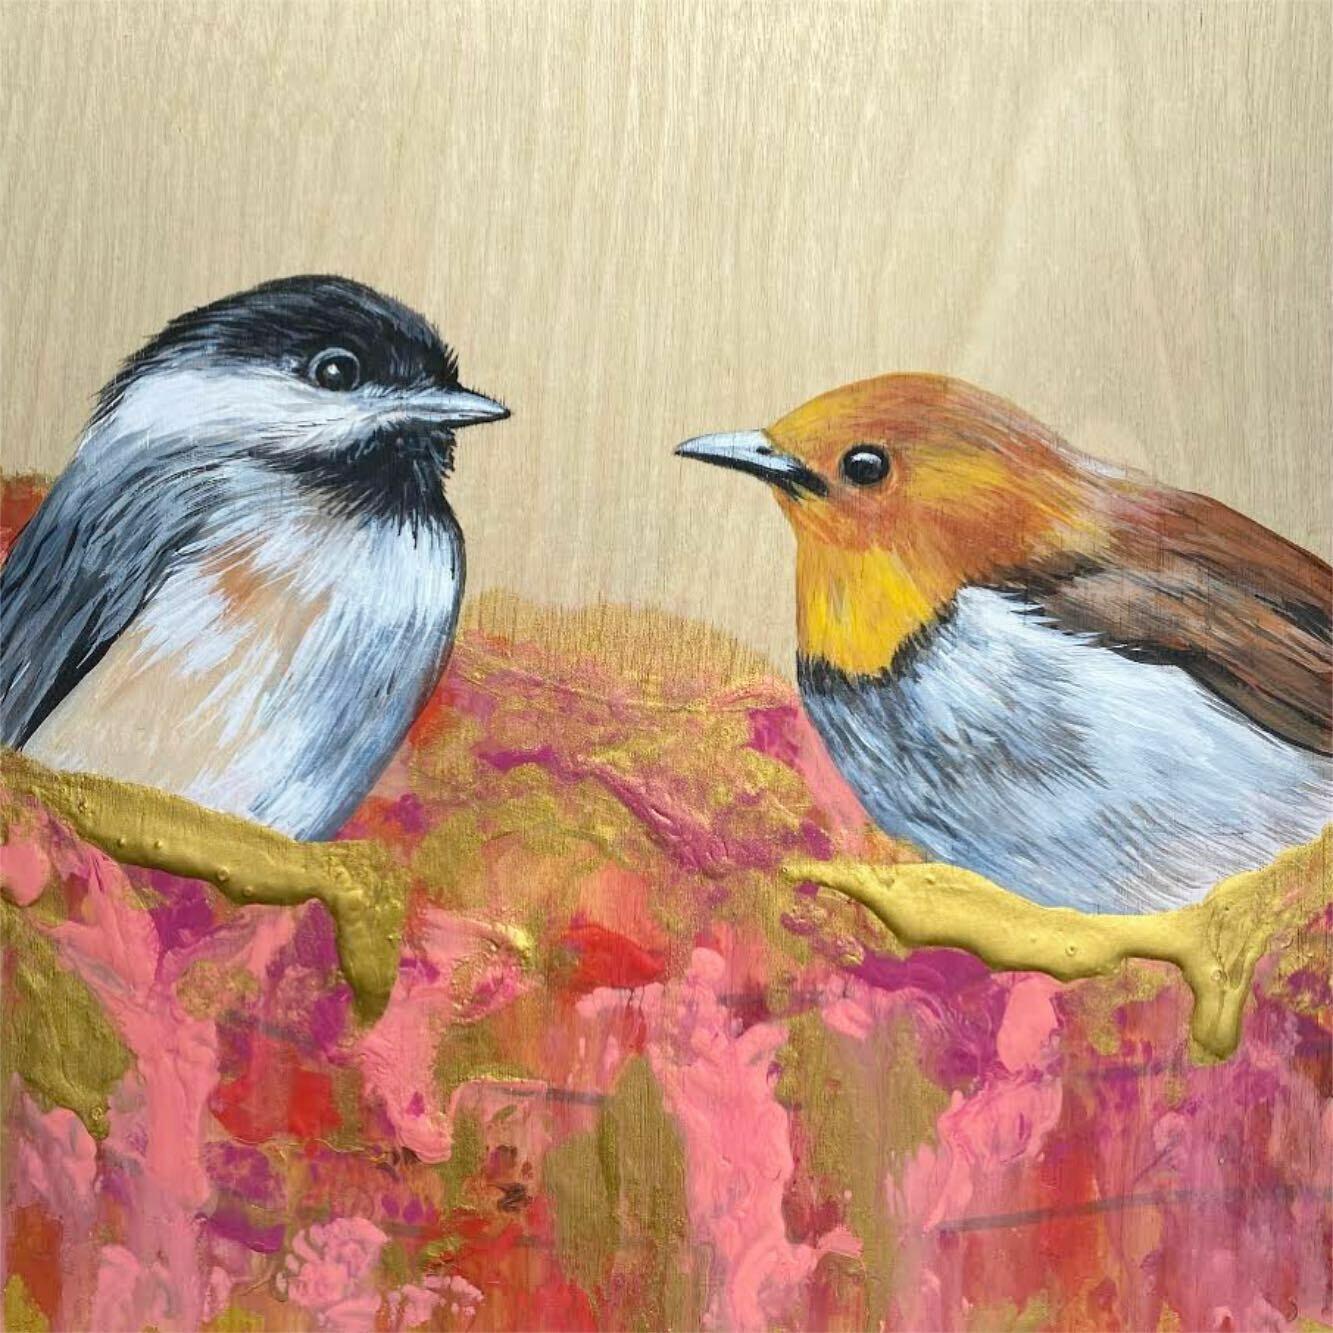 Print of Carolina Chickadee and Friend painting